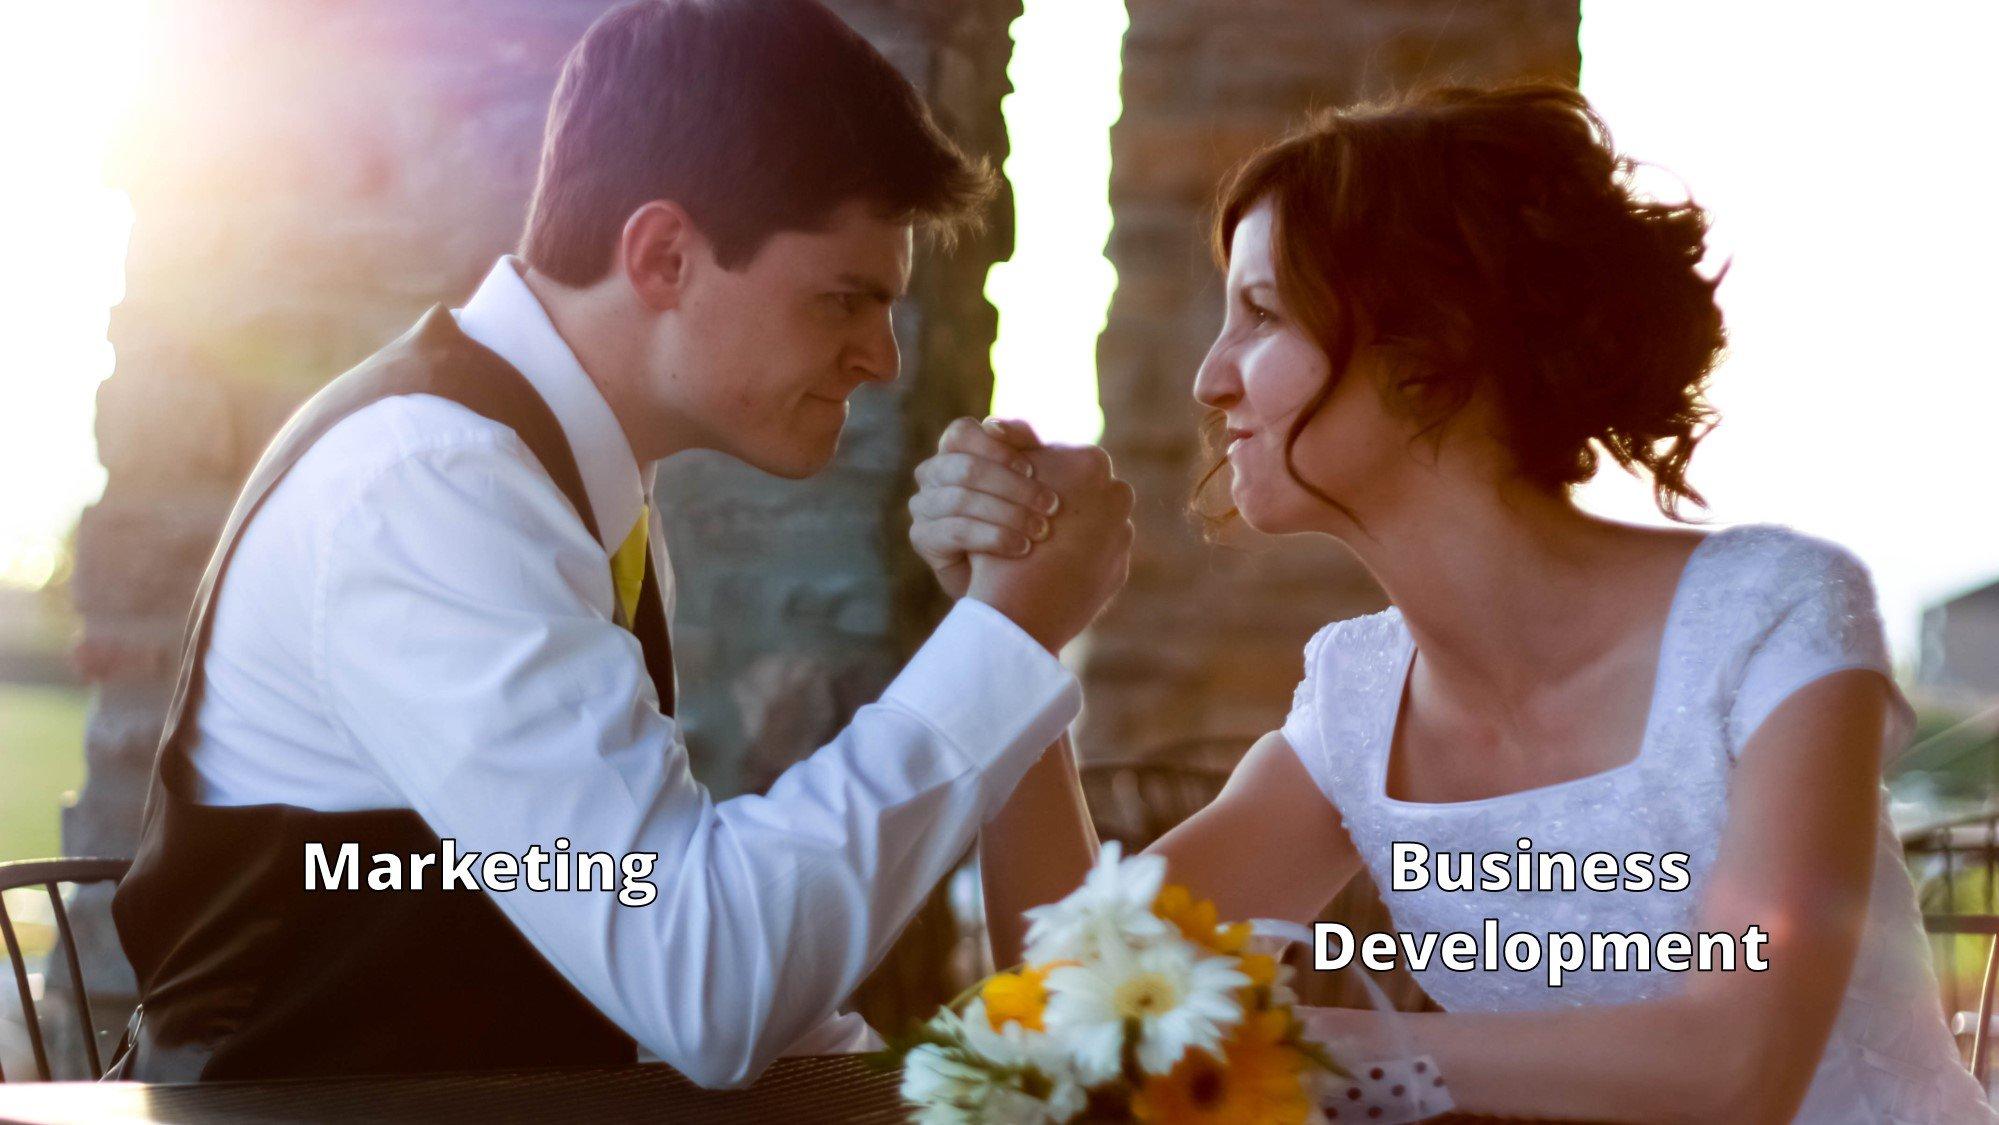 marketing vs business development